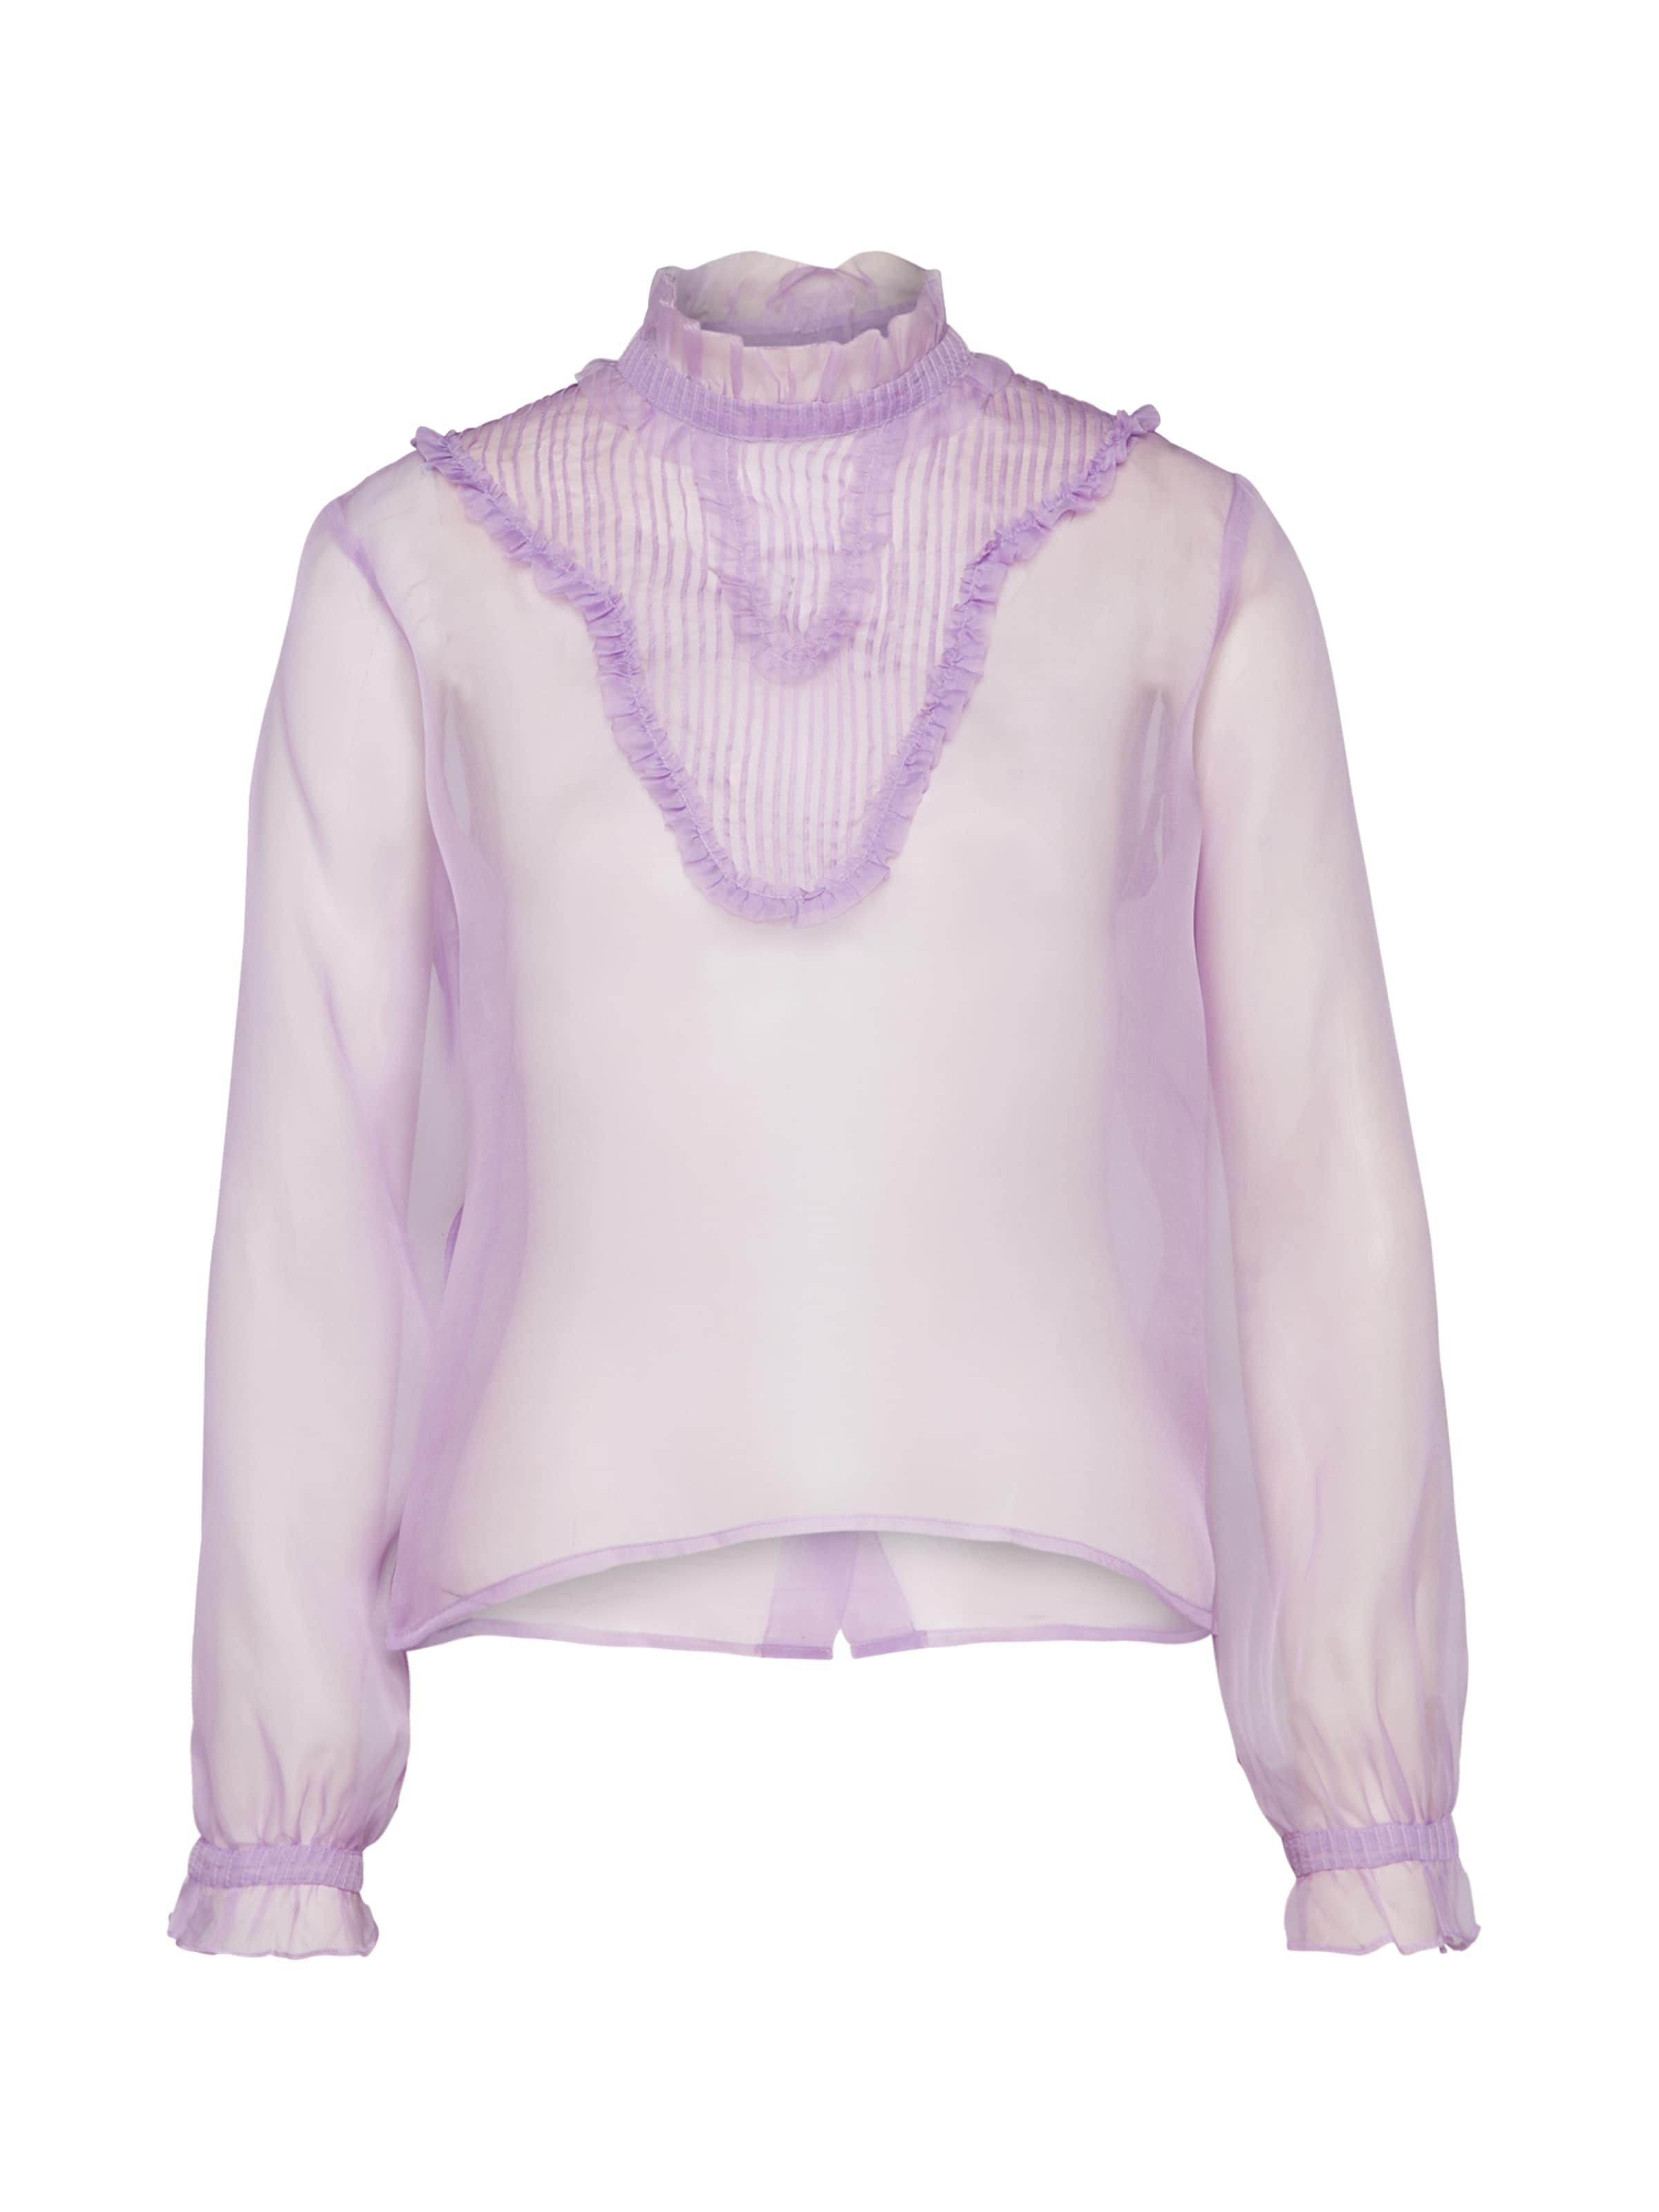 'posamaranth Silk' Postyr Lavendel In Tunika TuFJ5cKl31